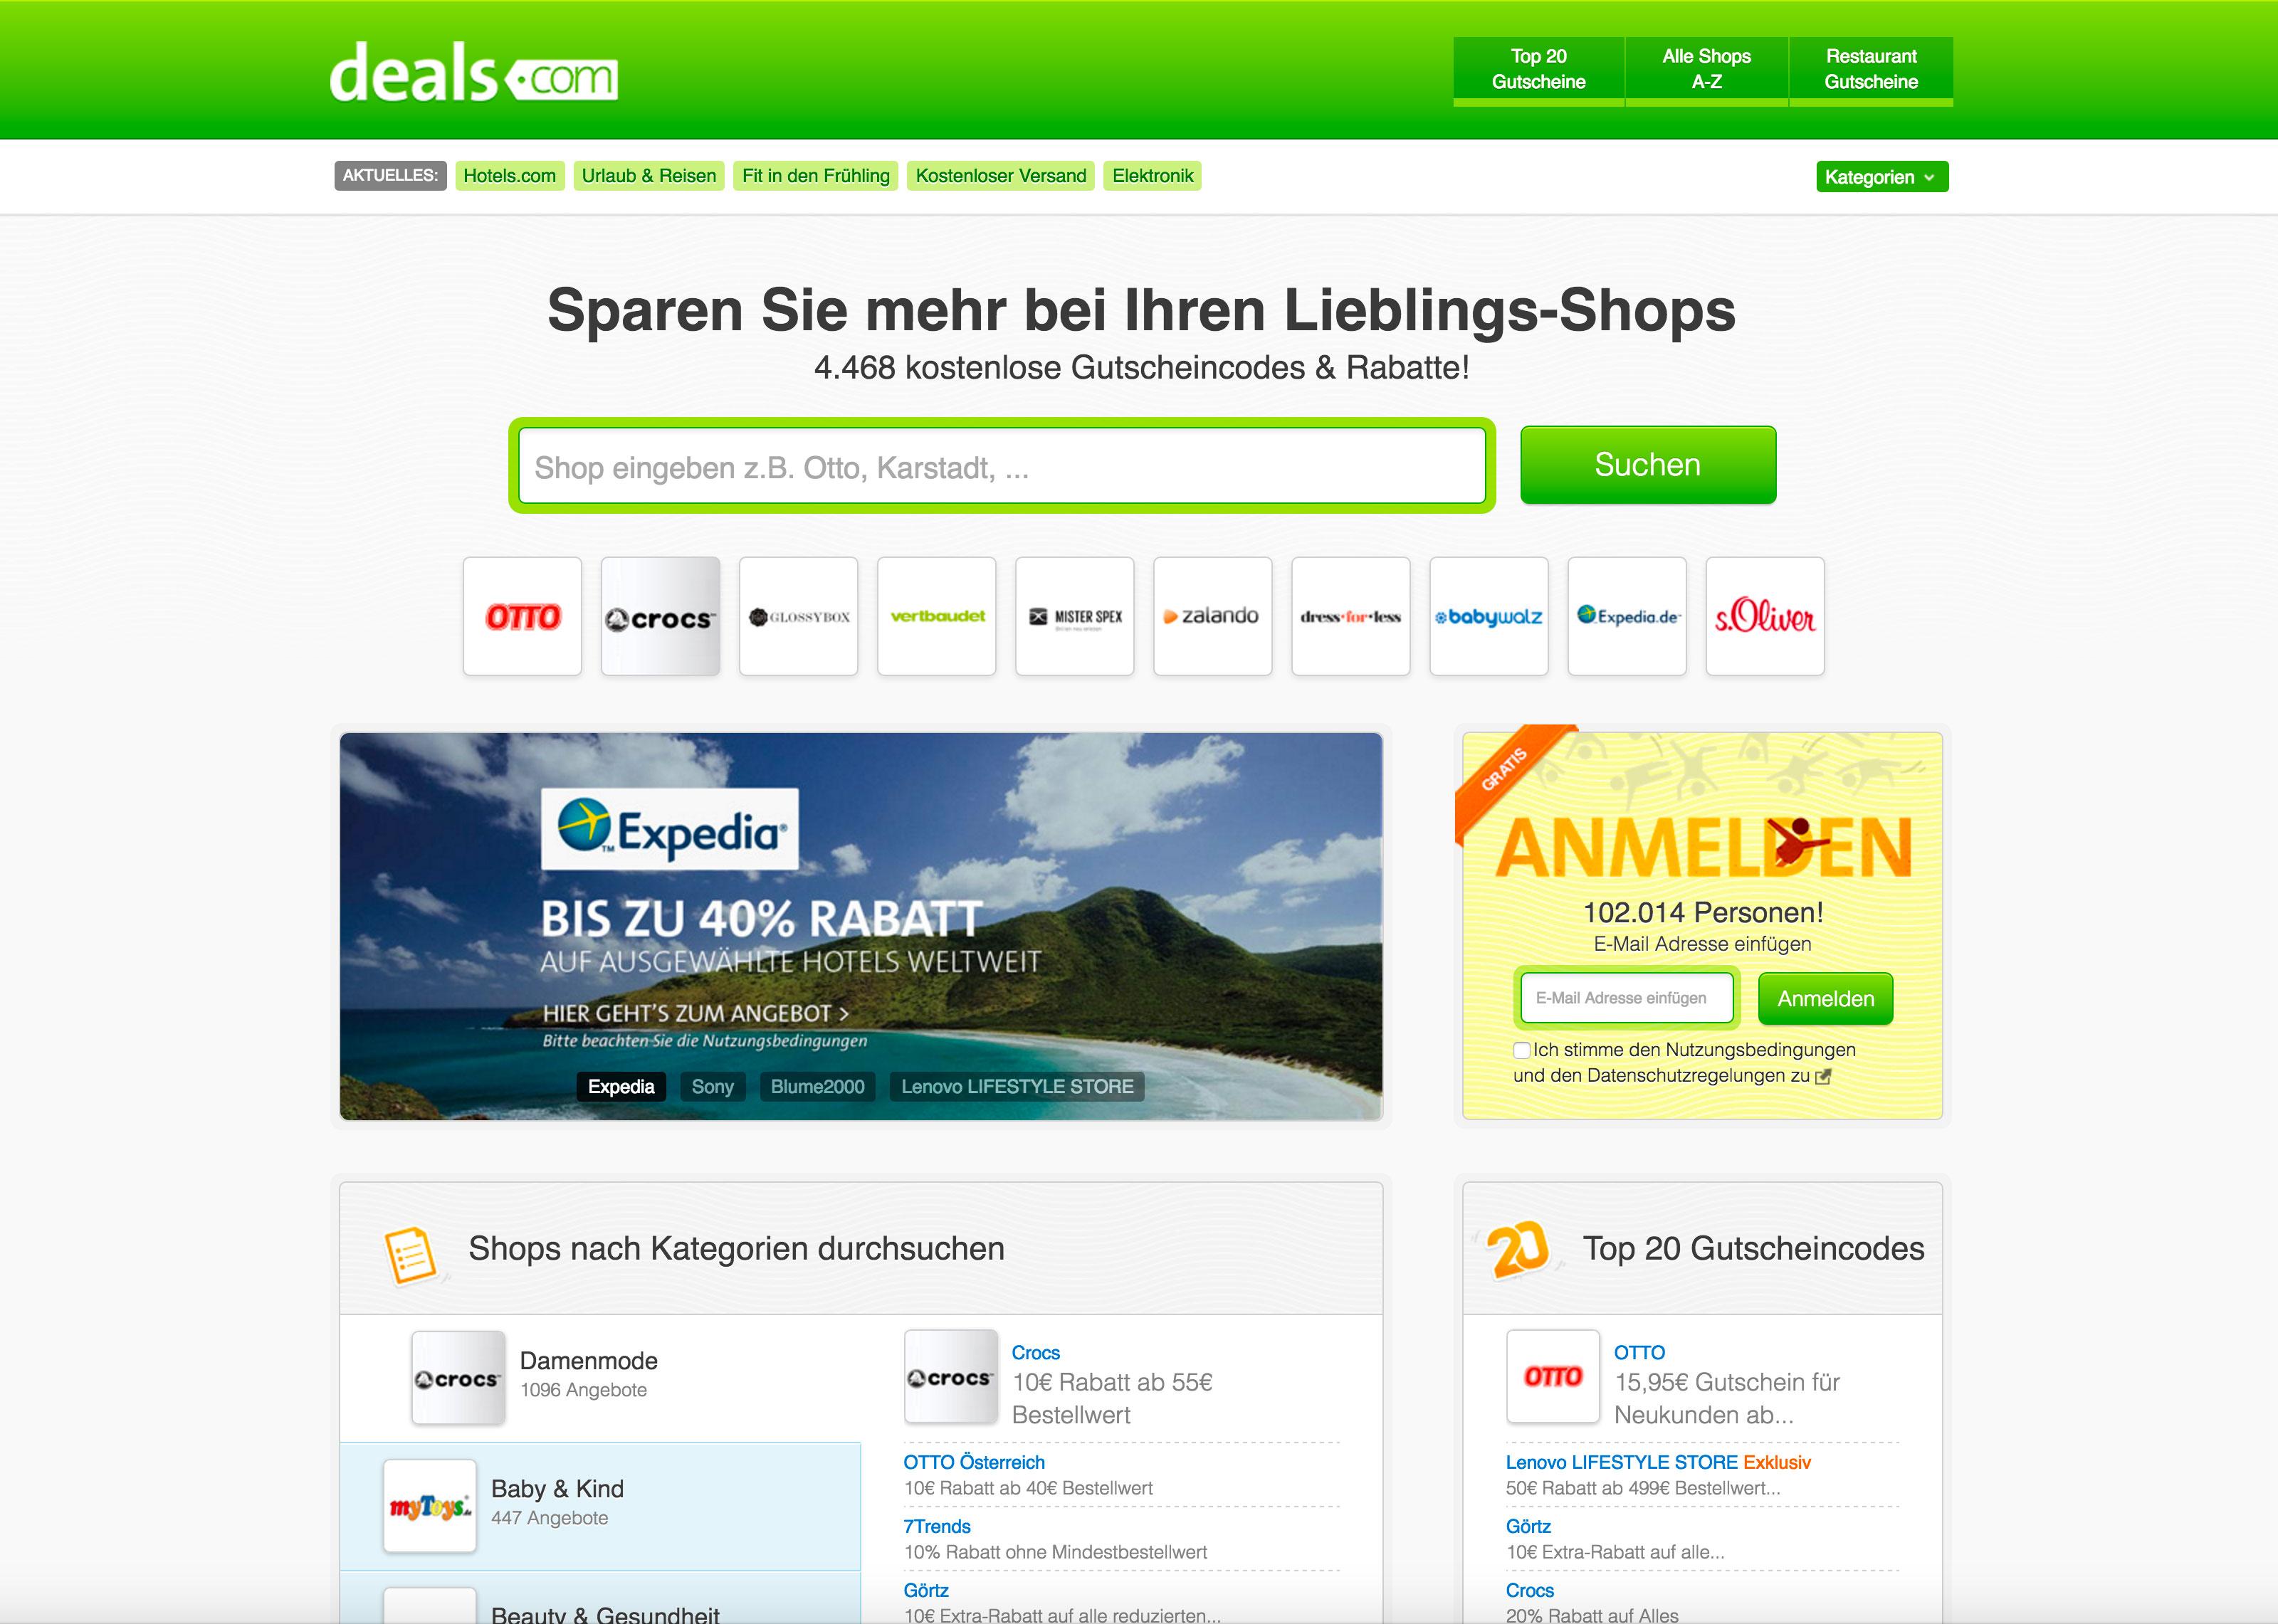 Screenshot of Deals.com homepage